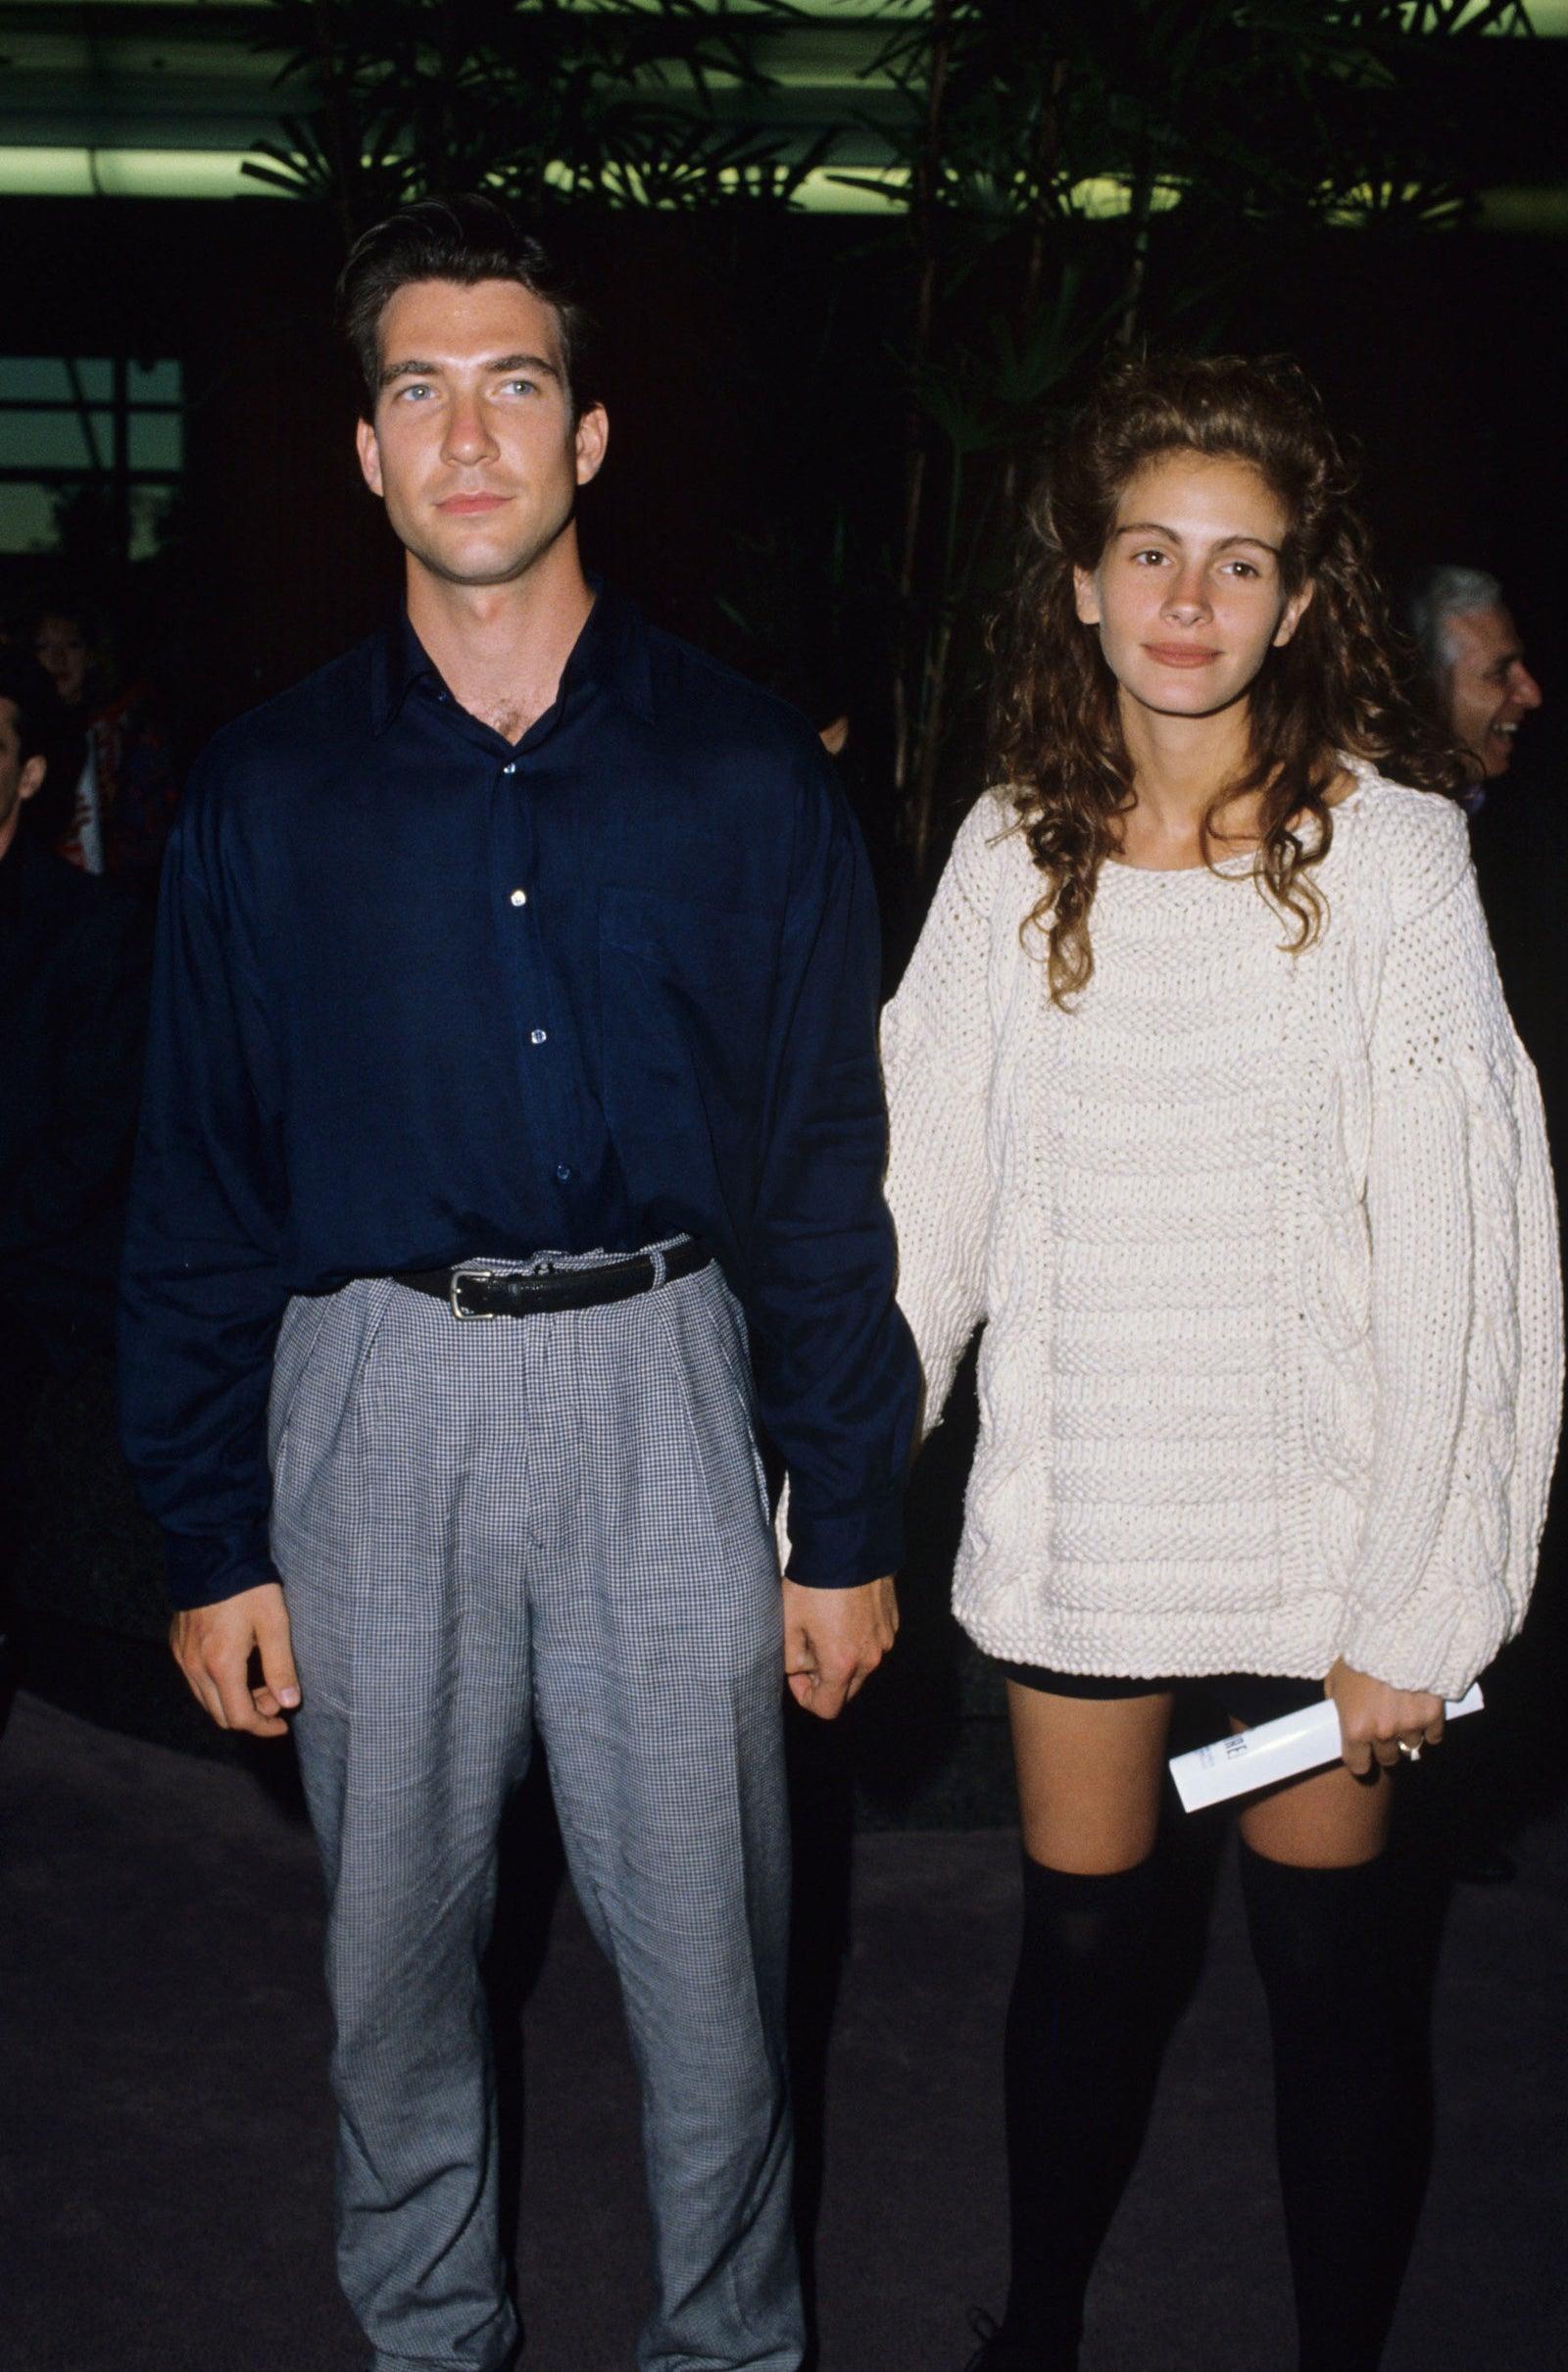 Julia Roberts and fiance Dylan McDermott